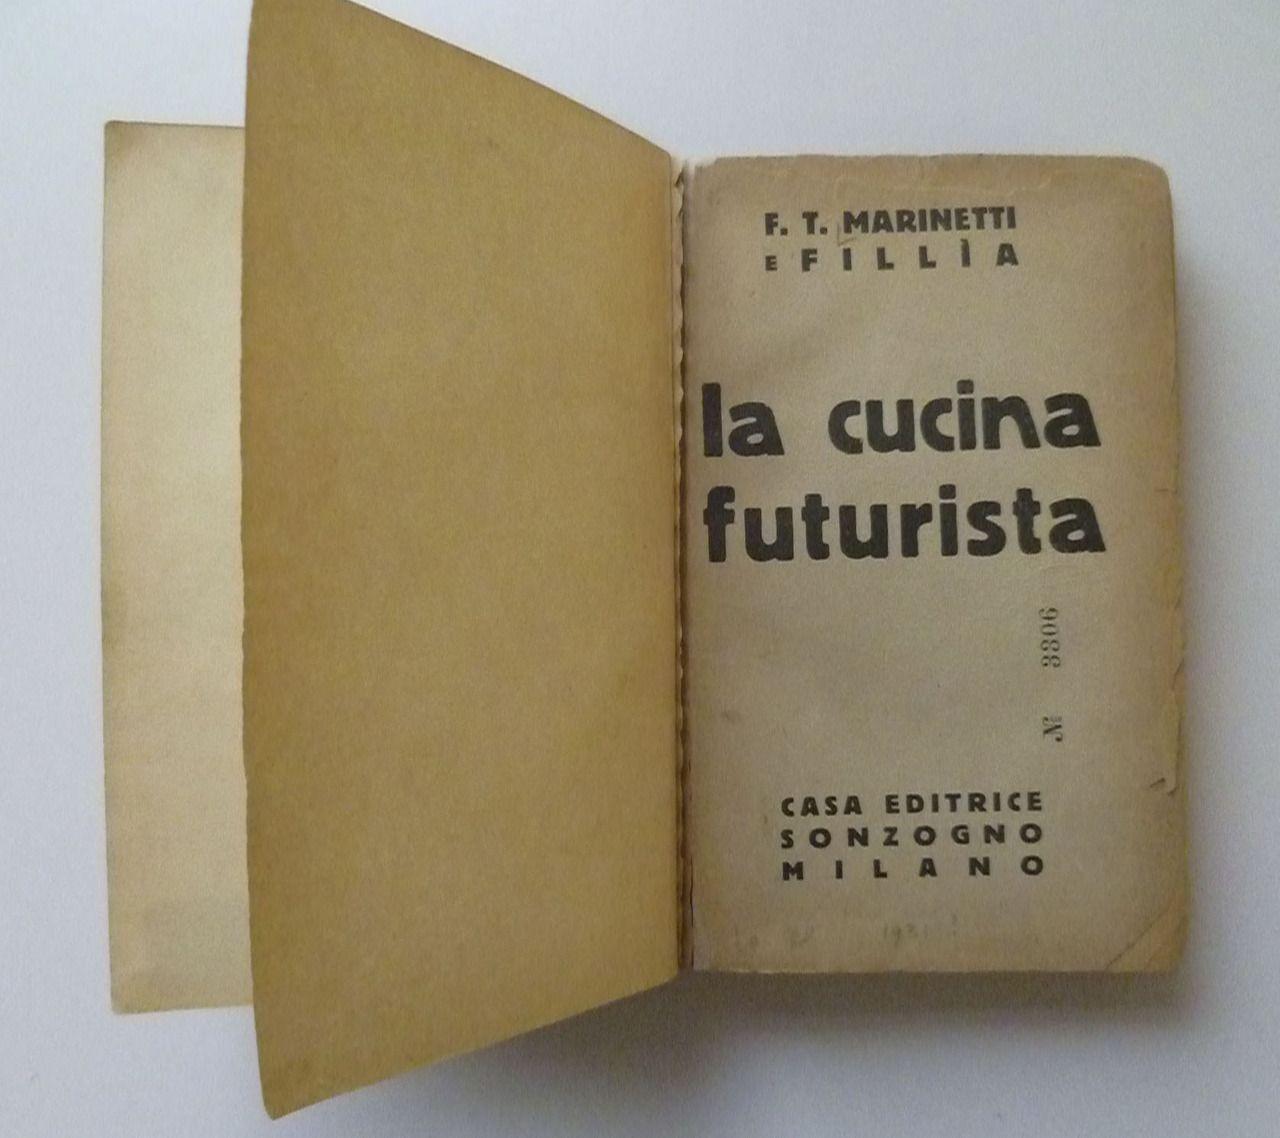 La Cucina Futurista 1932